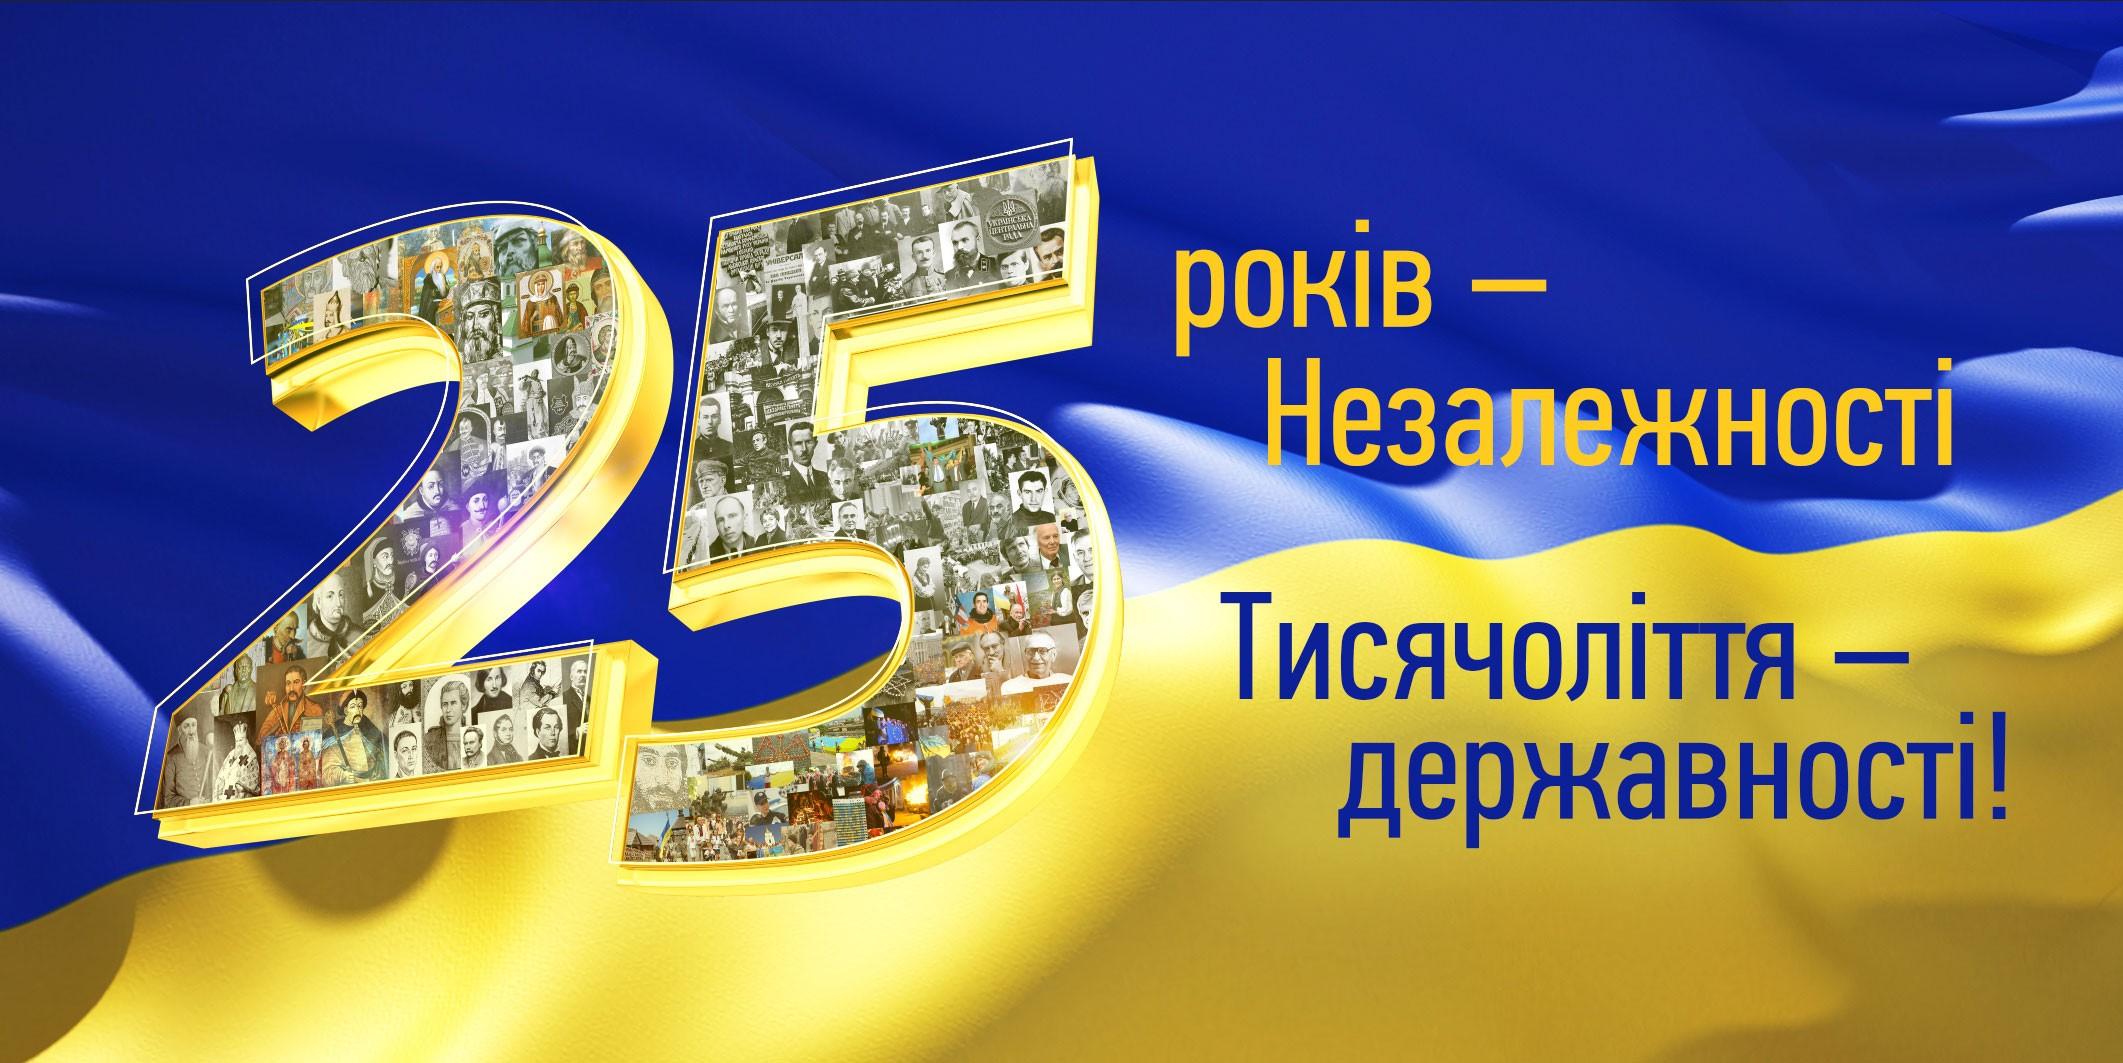 http://lubotin.kharkov.ua/uploads/posts/2016-08/1471429909_board1.jpg